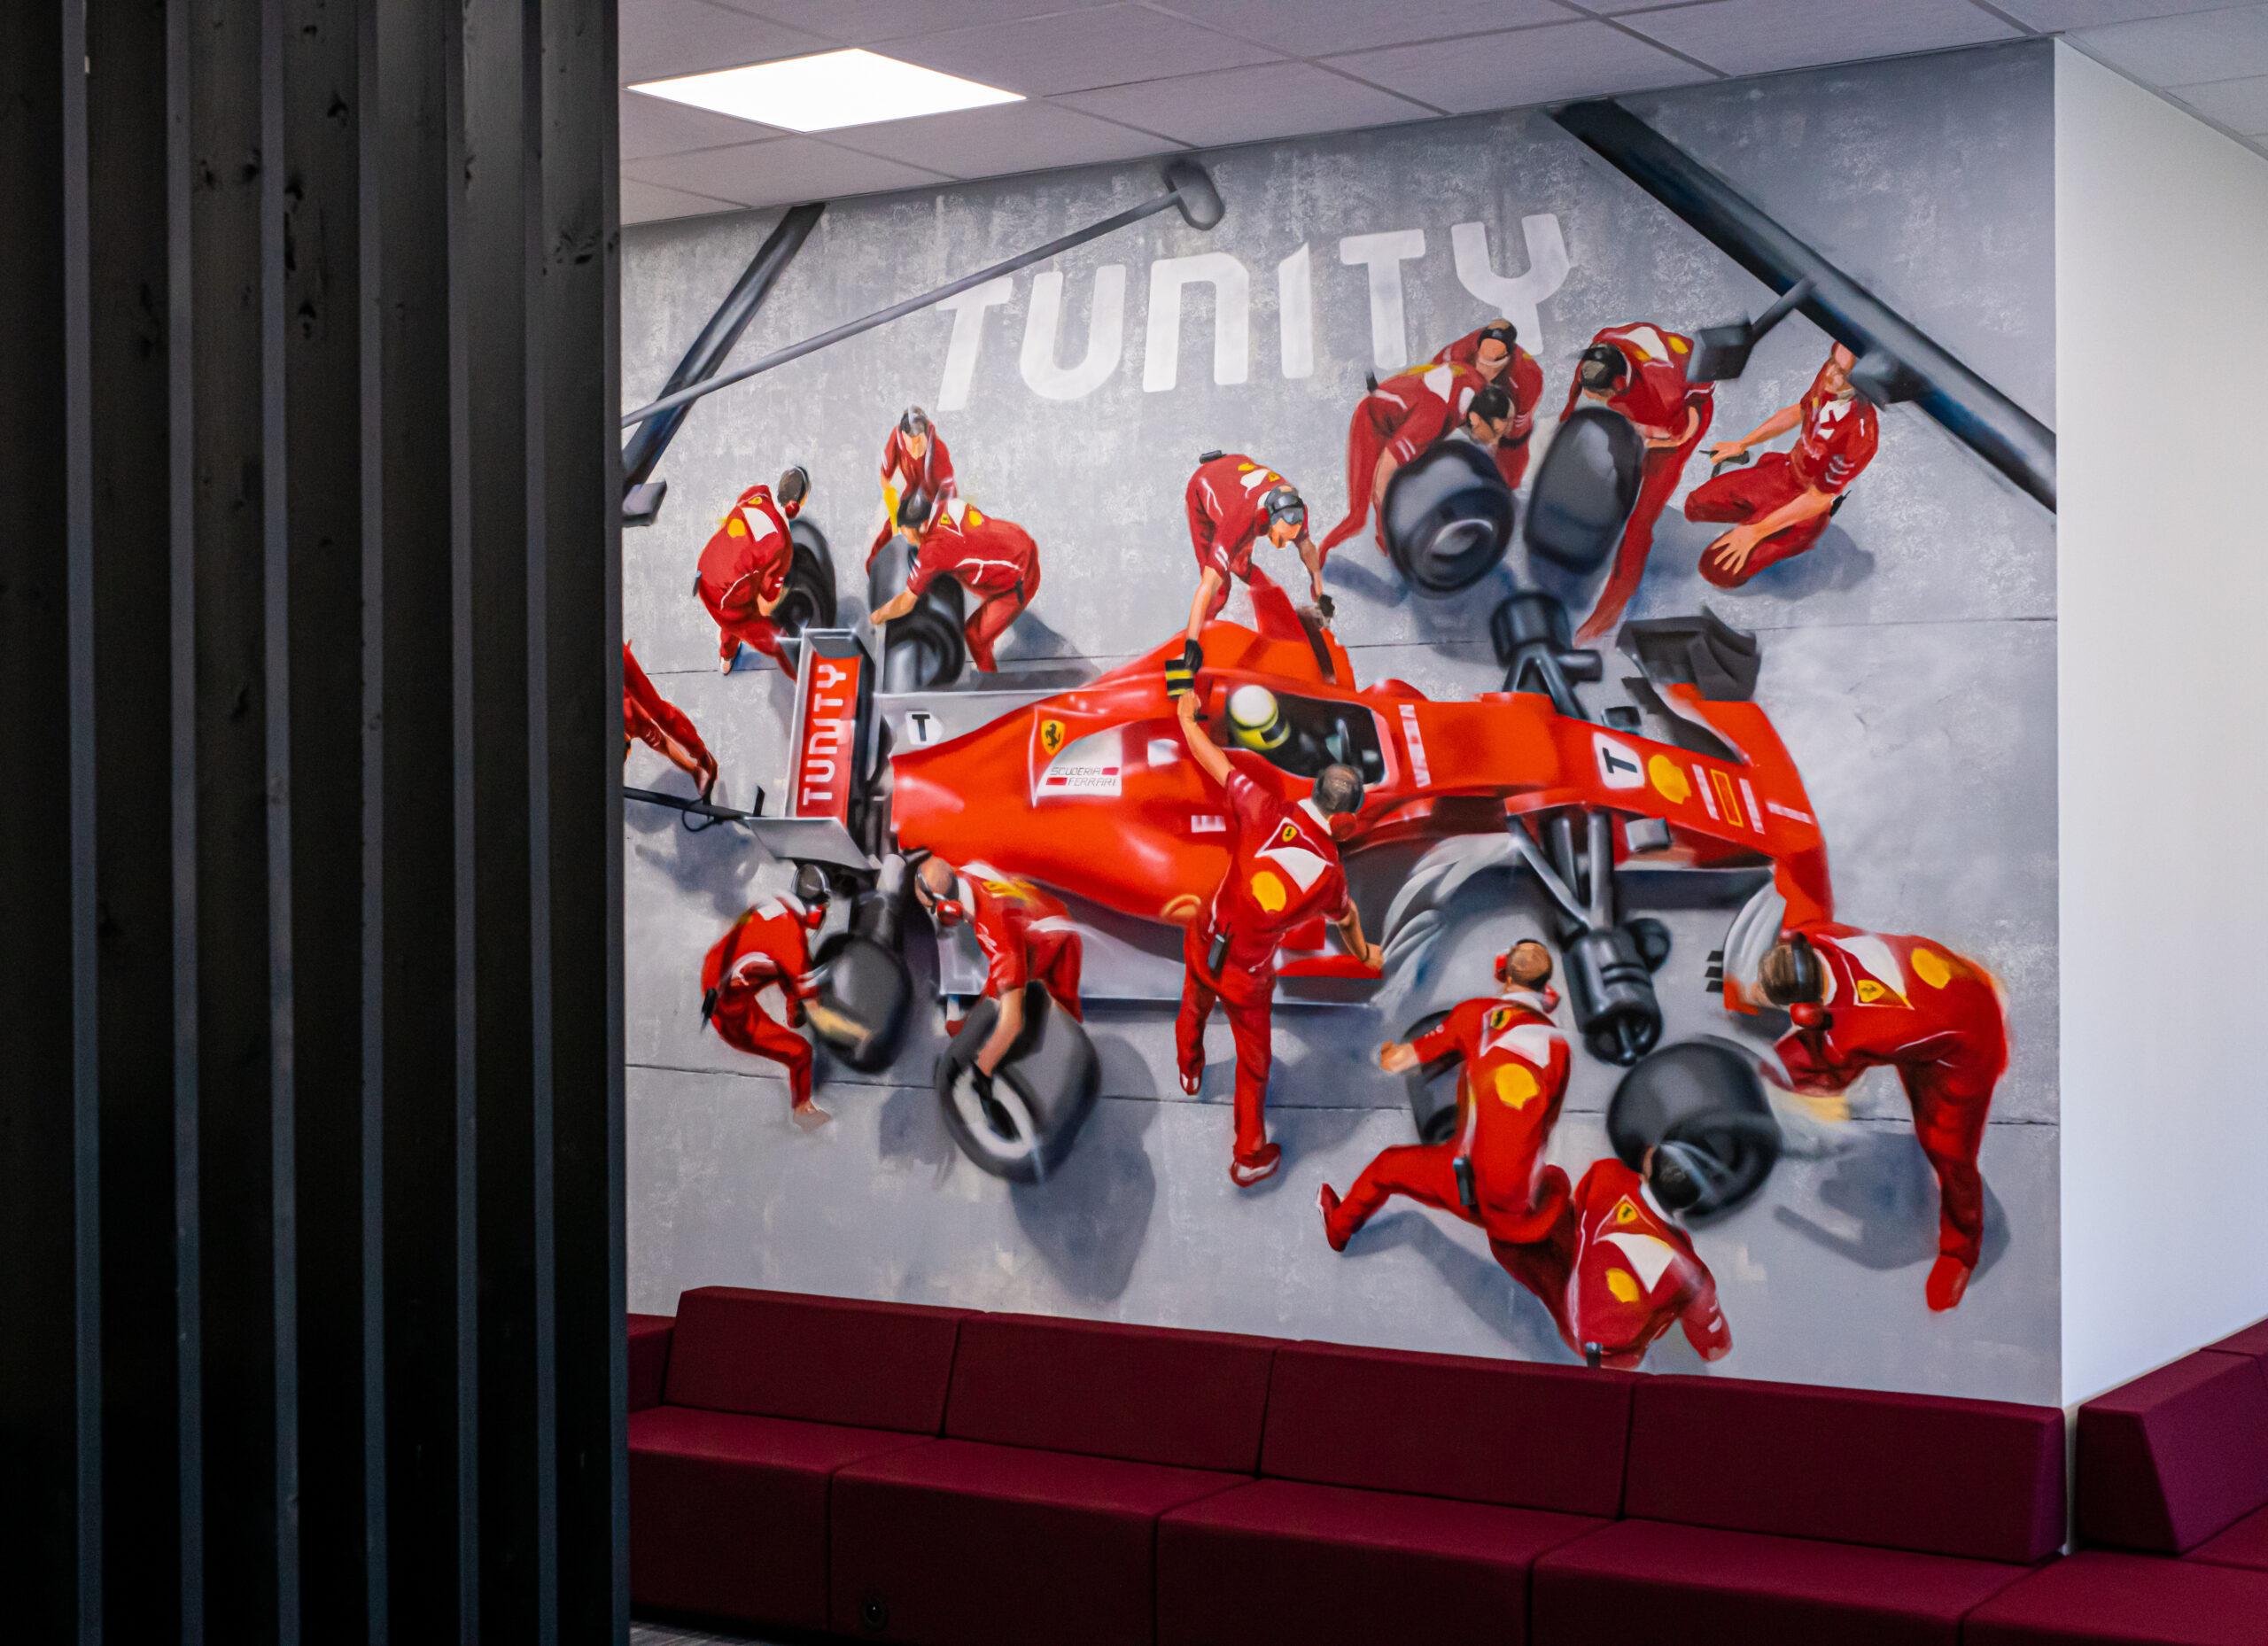 Klant-behandelen-als-Ferrari